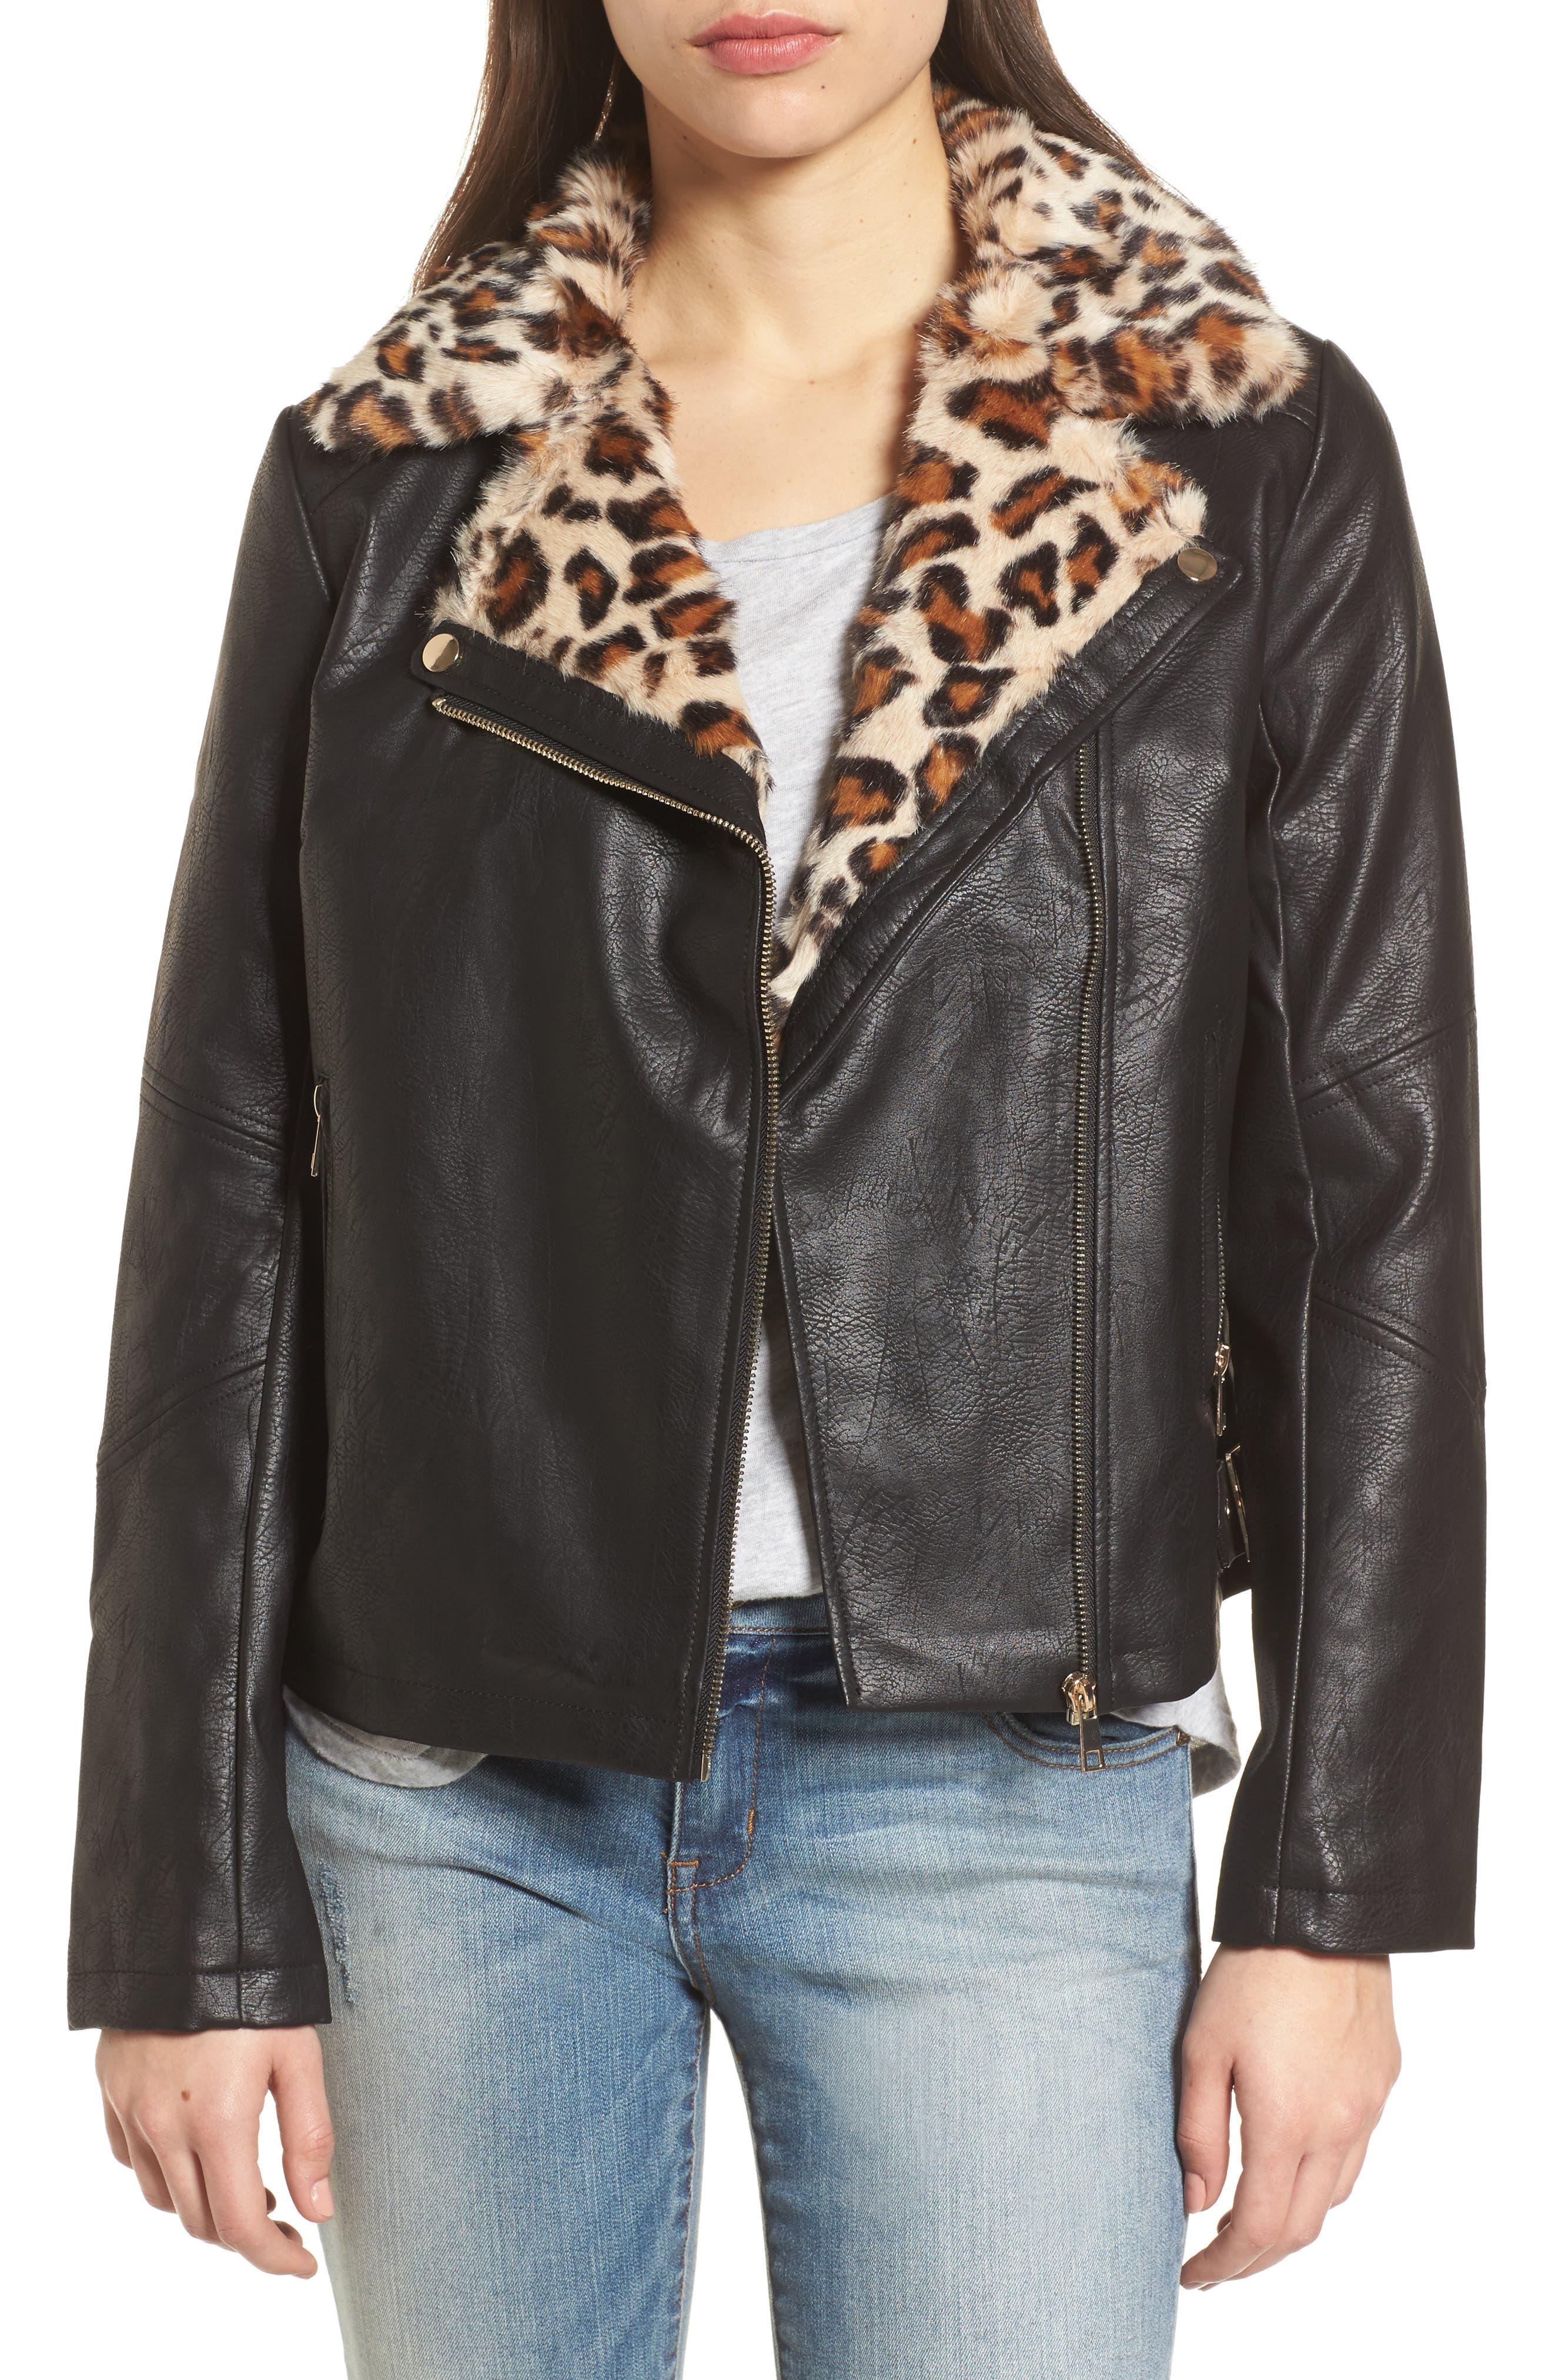 Main Image - Dorothy Perkins Faux Leather Biker Jacket with Faux Fur Trim